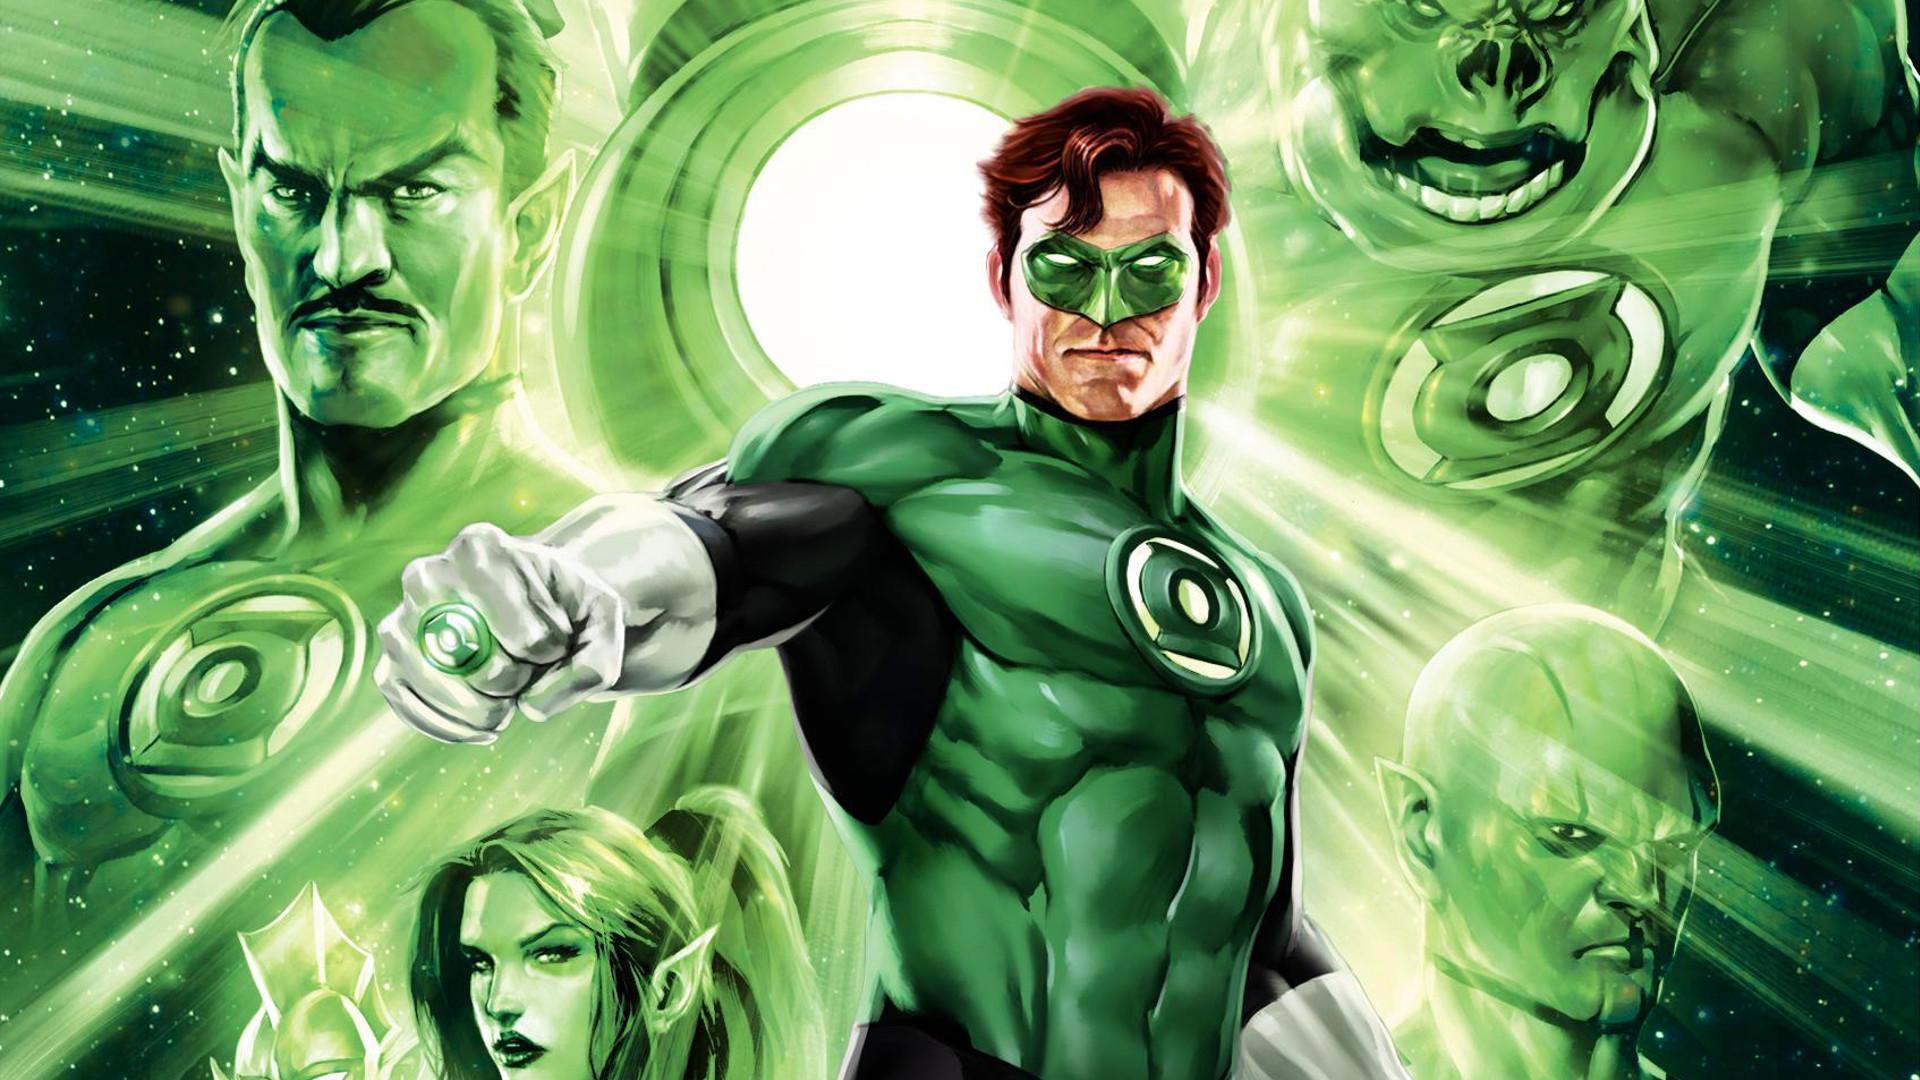 Green Lantern emerald knights HD Wallpaper Background Image 1920x1080